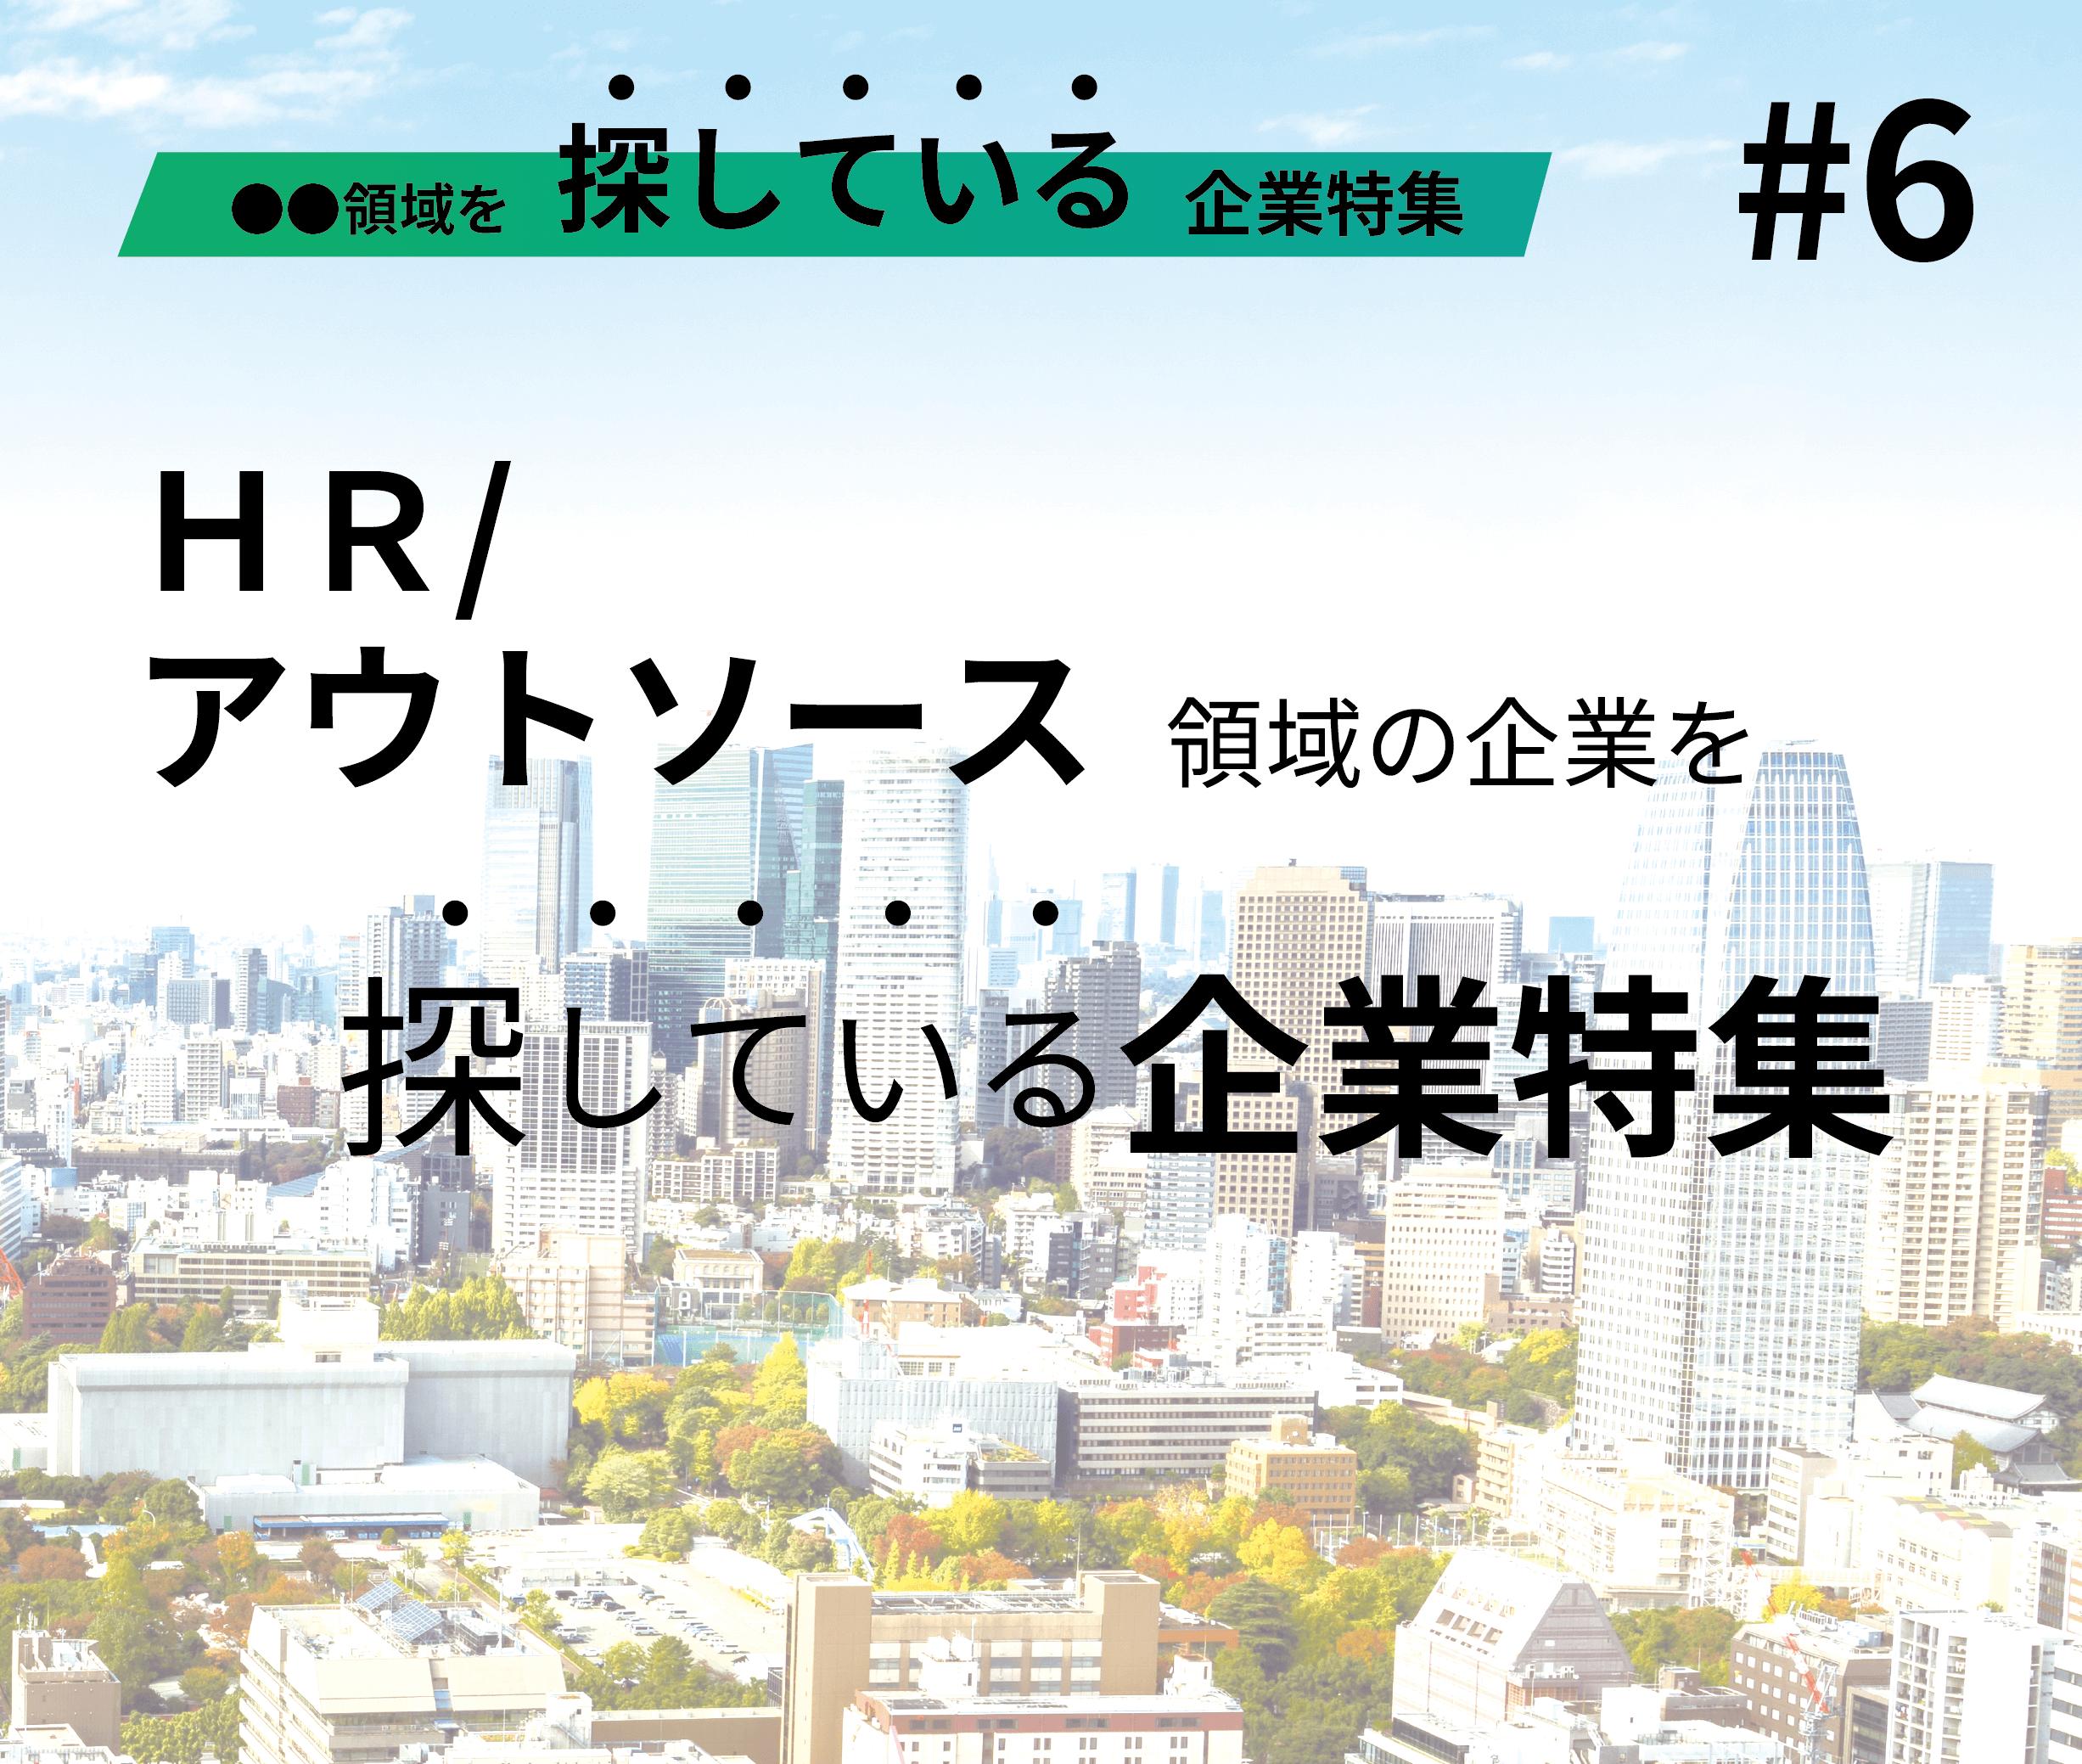 【HR/アウトソース】領域の企業を探している企業特集